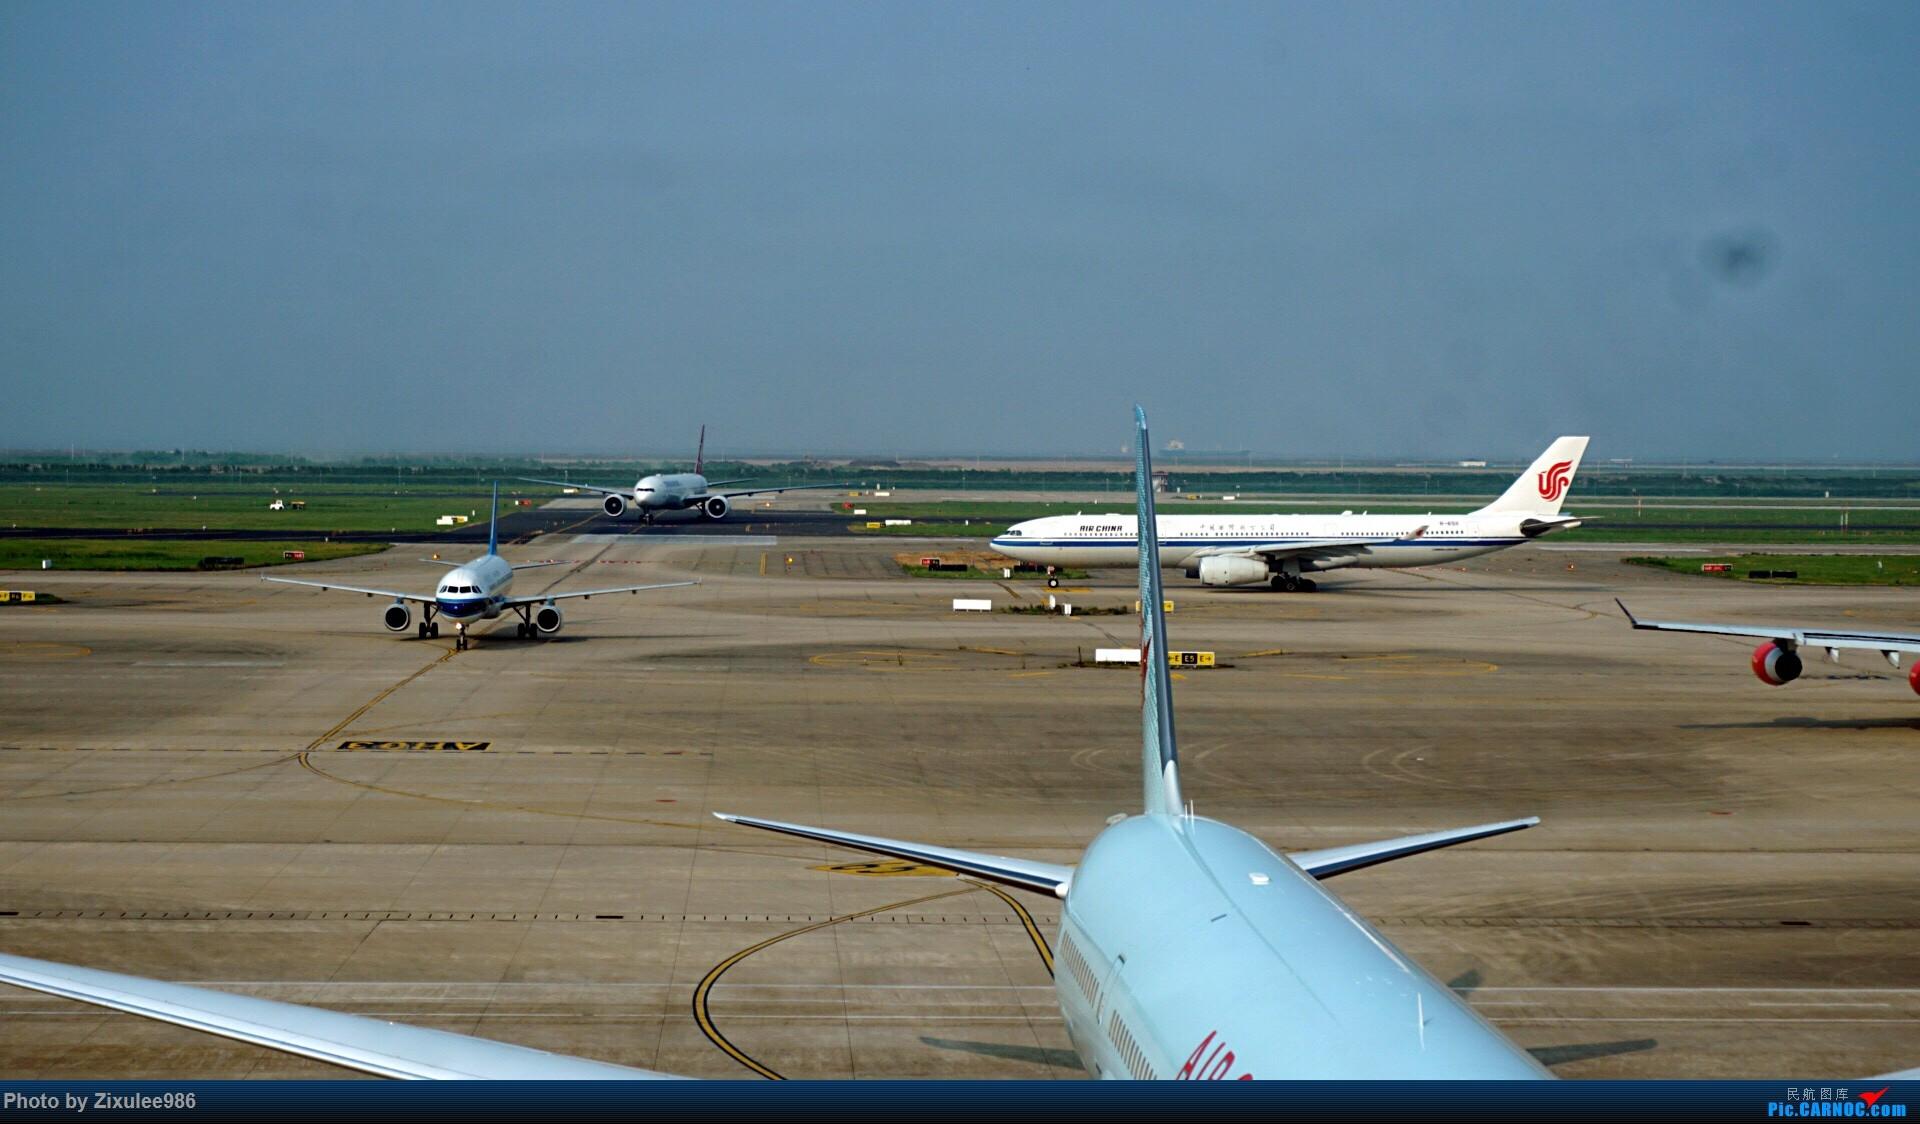 Re:[原创]加拿大21日游学之旅(一)~JJN-PVG-YYZ..(内含flightlog)~第一次发游记~多图缓更请谅解 AIRBUS A330-300 B-6511 中国上海浦东国际机场